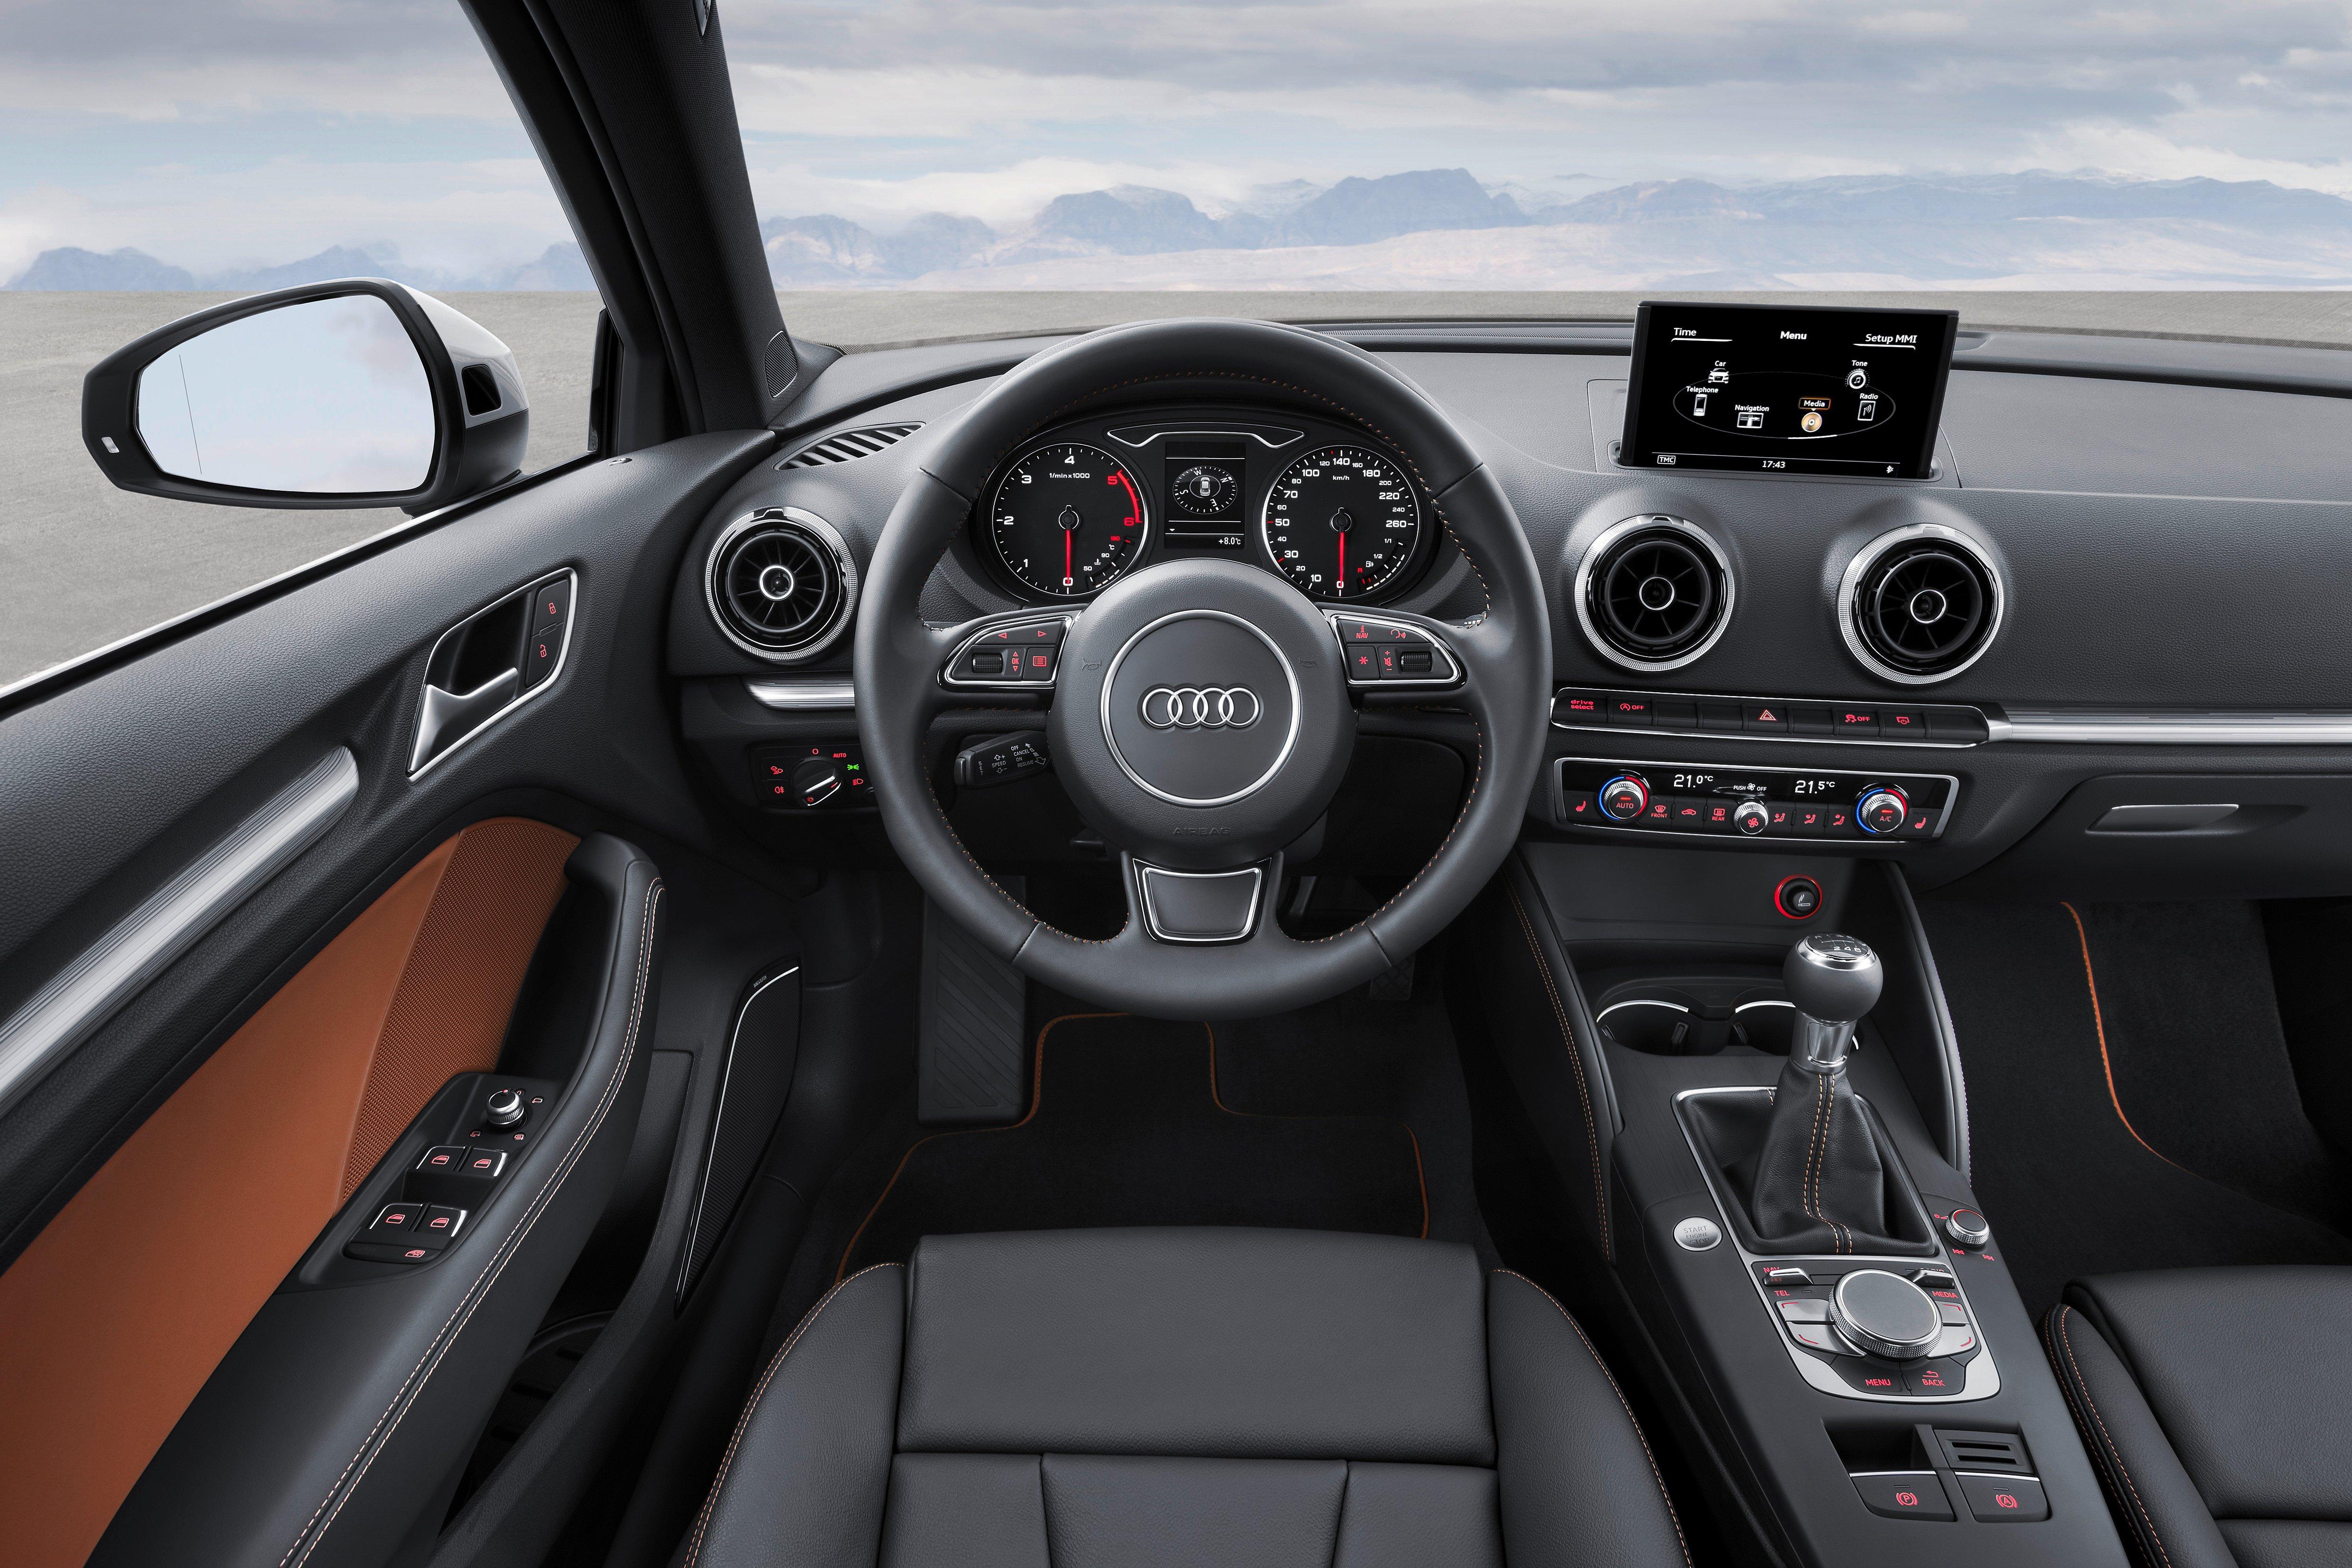 new audi a3 sedan and hot 300 hp s3 sedan unveiled image 164075